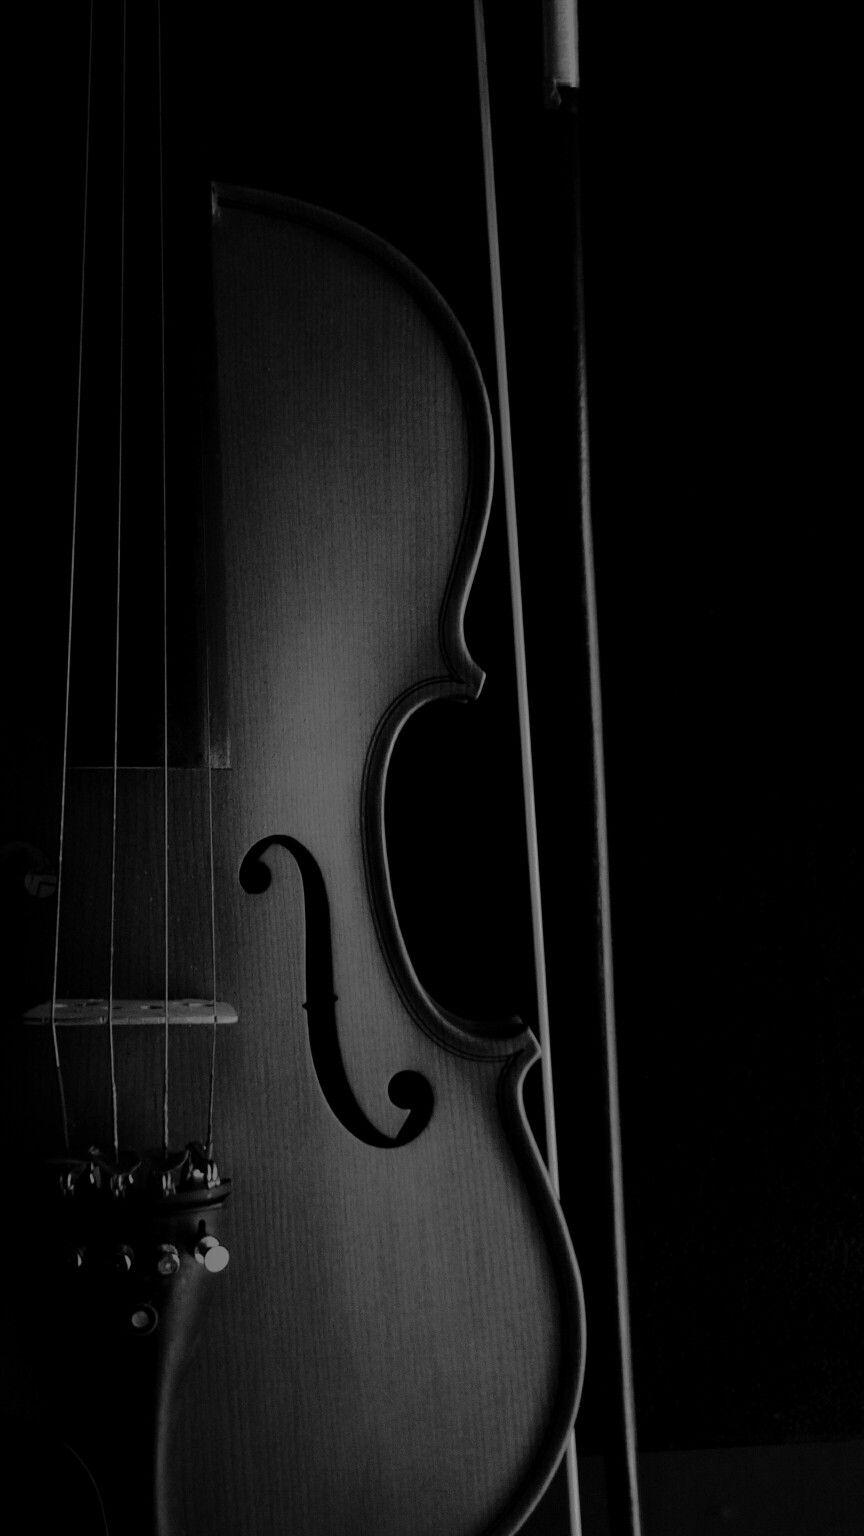 Pin By Dallascowboysgirl 82 On Photography Violin Art Music Wallpaper Black And White Wallpaper